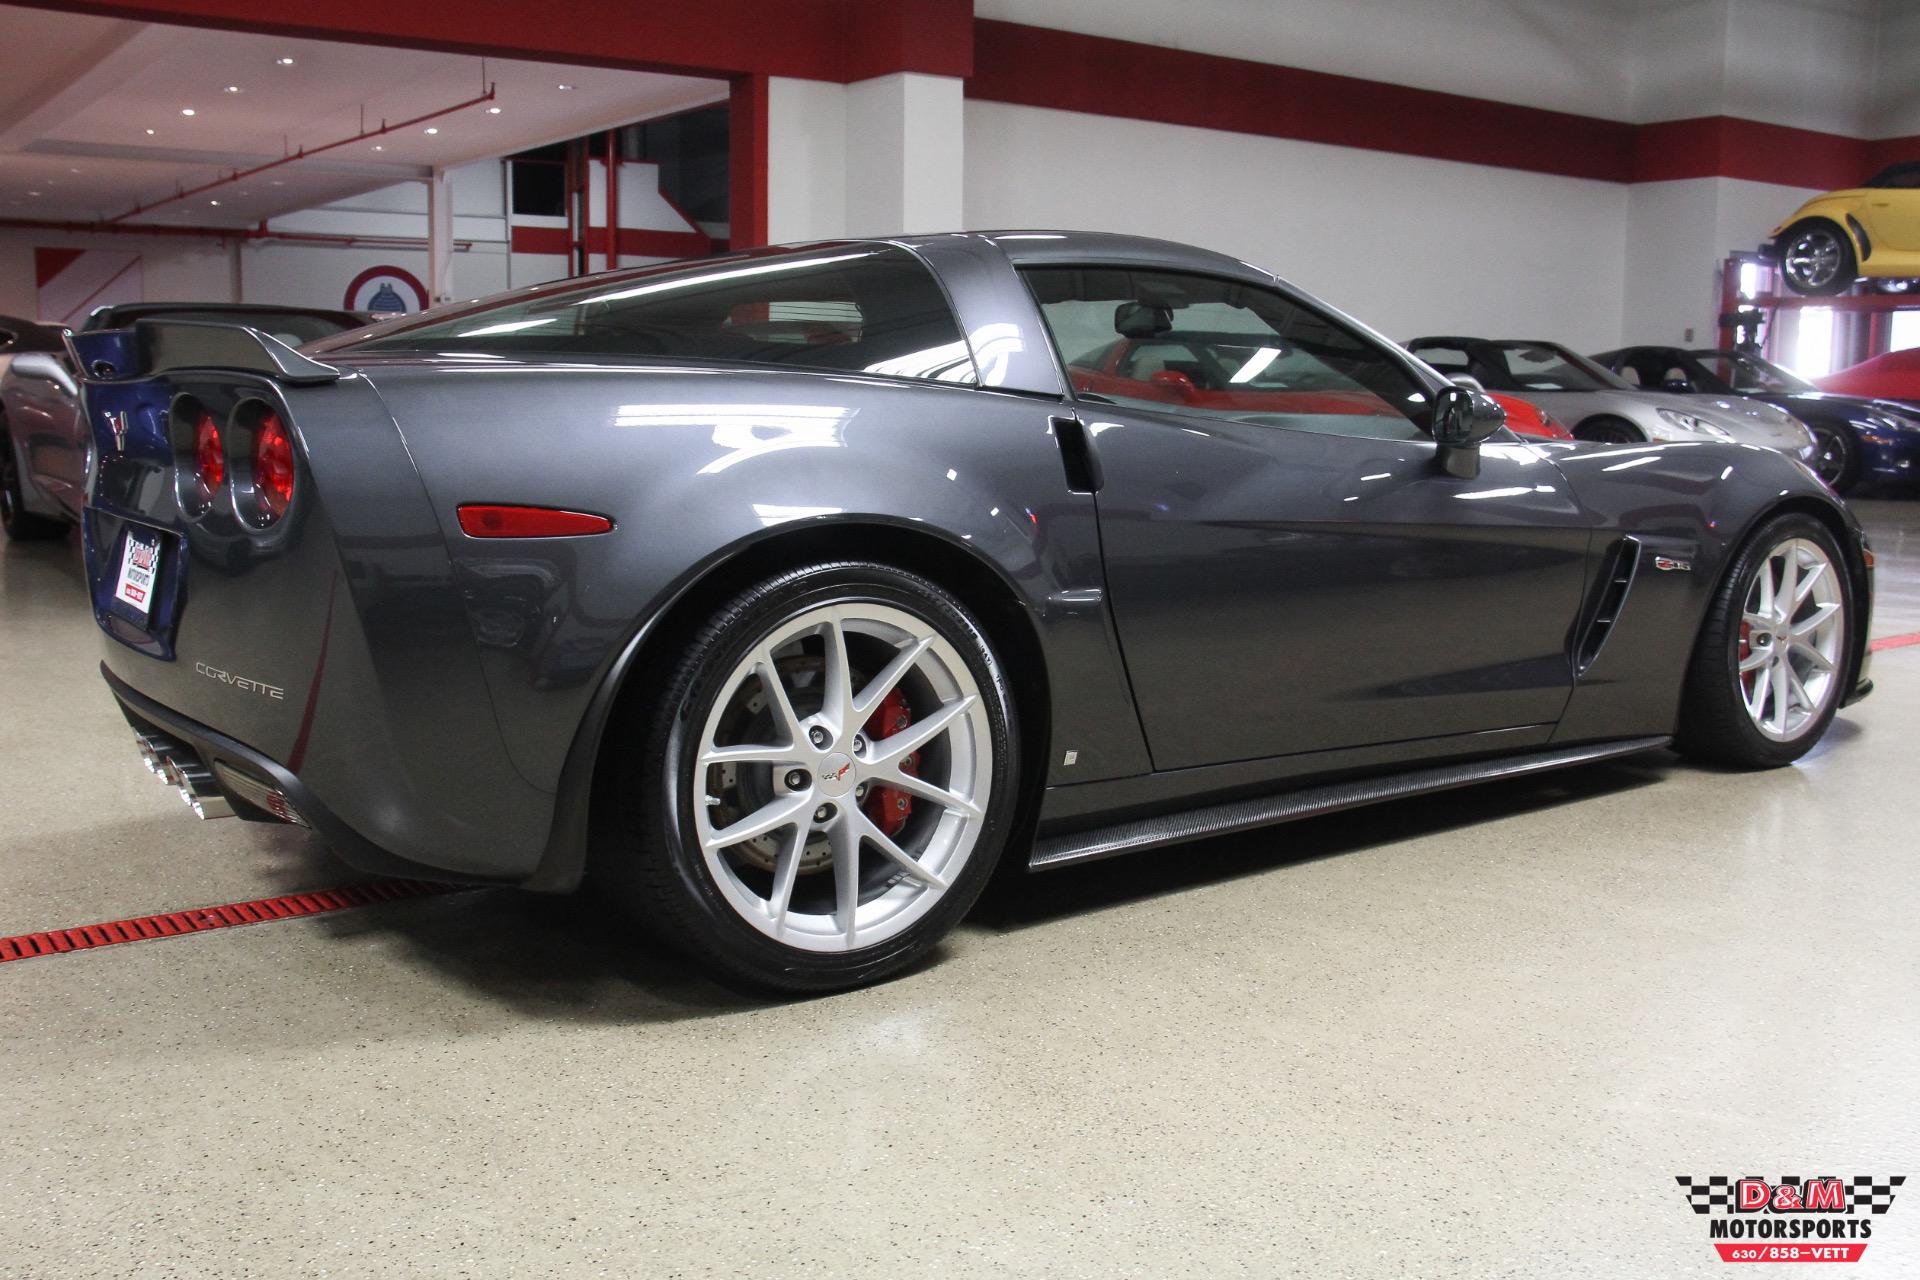 2009 chevrolet corvette z06 12853 miles cyber gray metallic used chevrolet corvette for sale. Black Bedroom Furniture Sets. Home Design Ideas